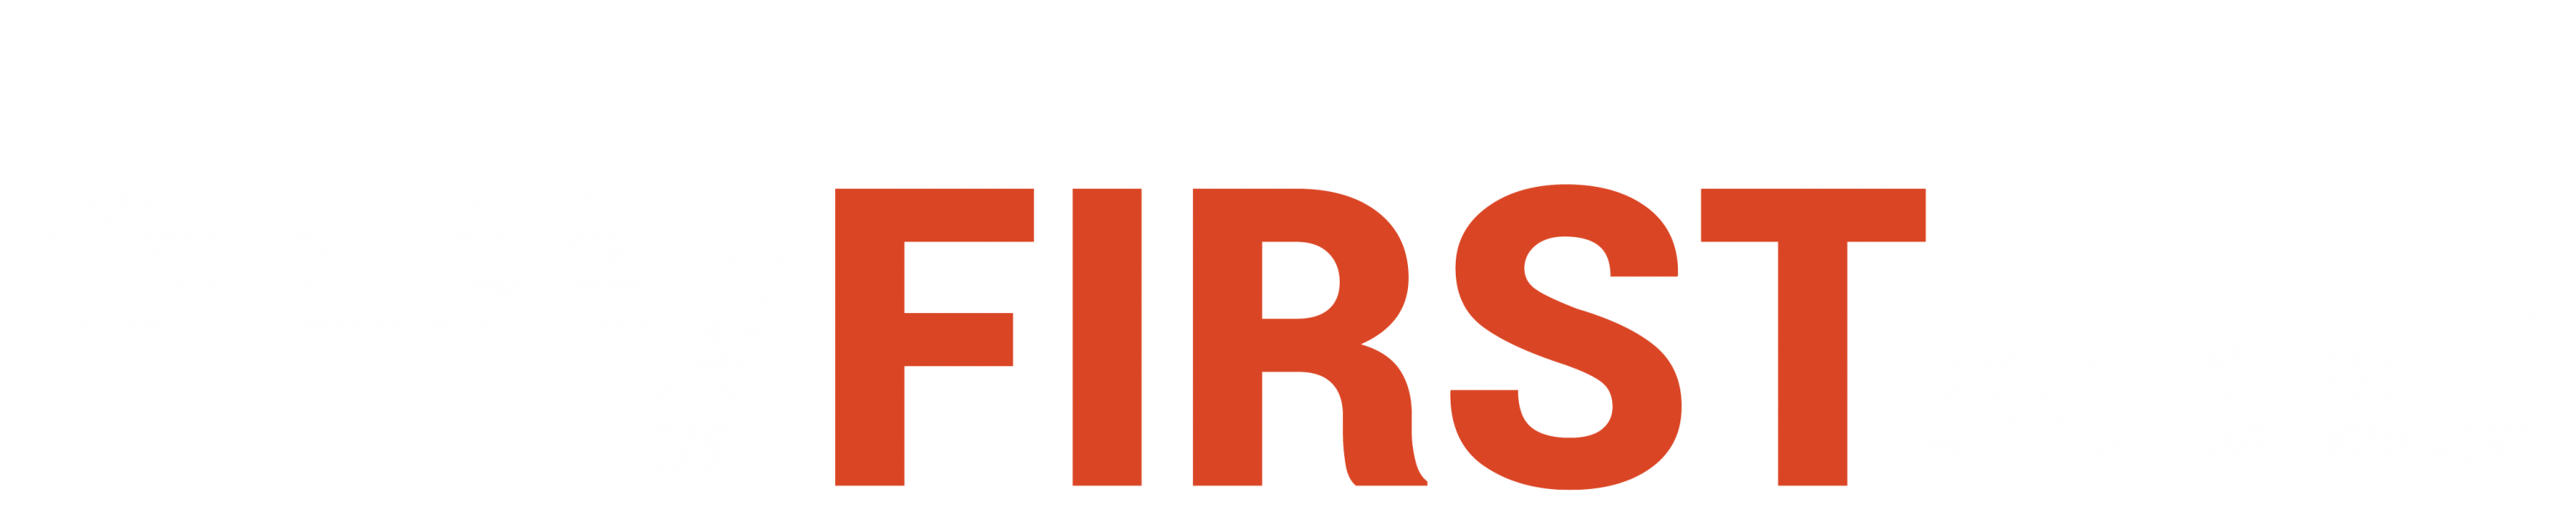 BHV-First Aid-tekst_wit